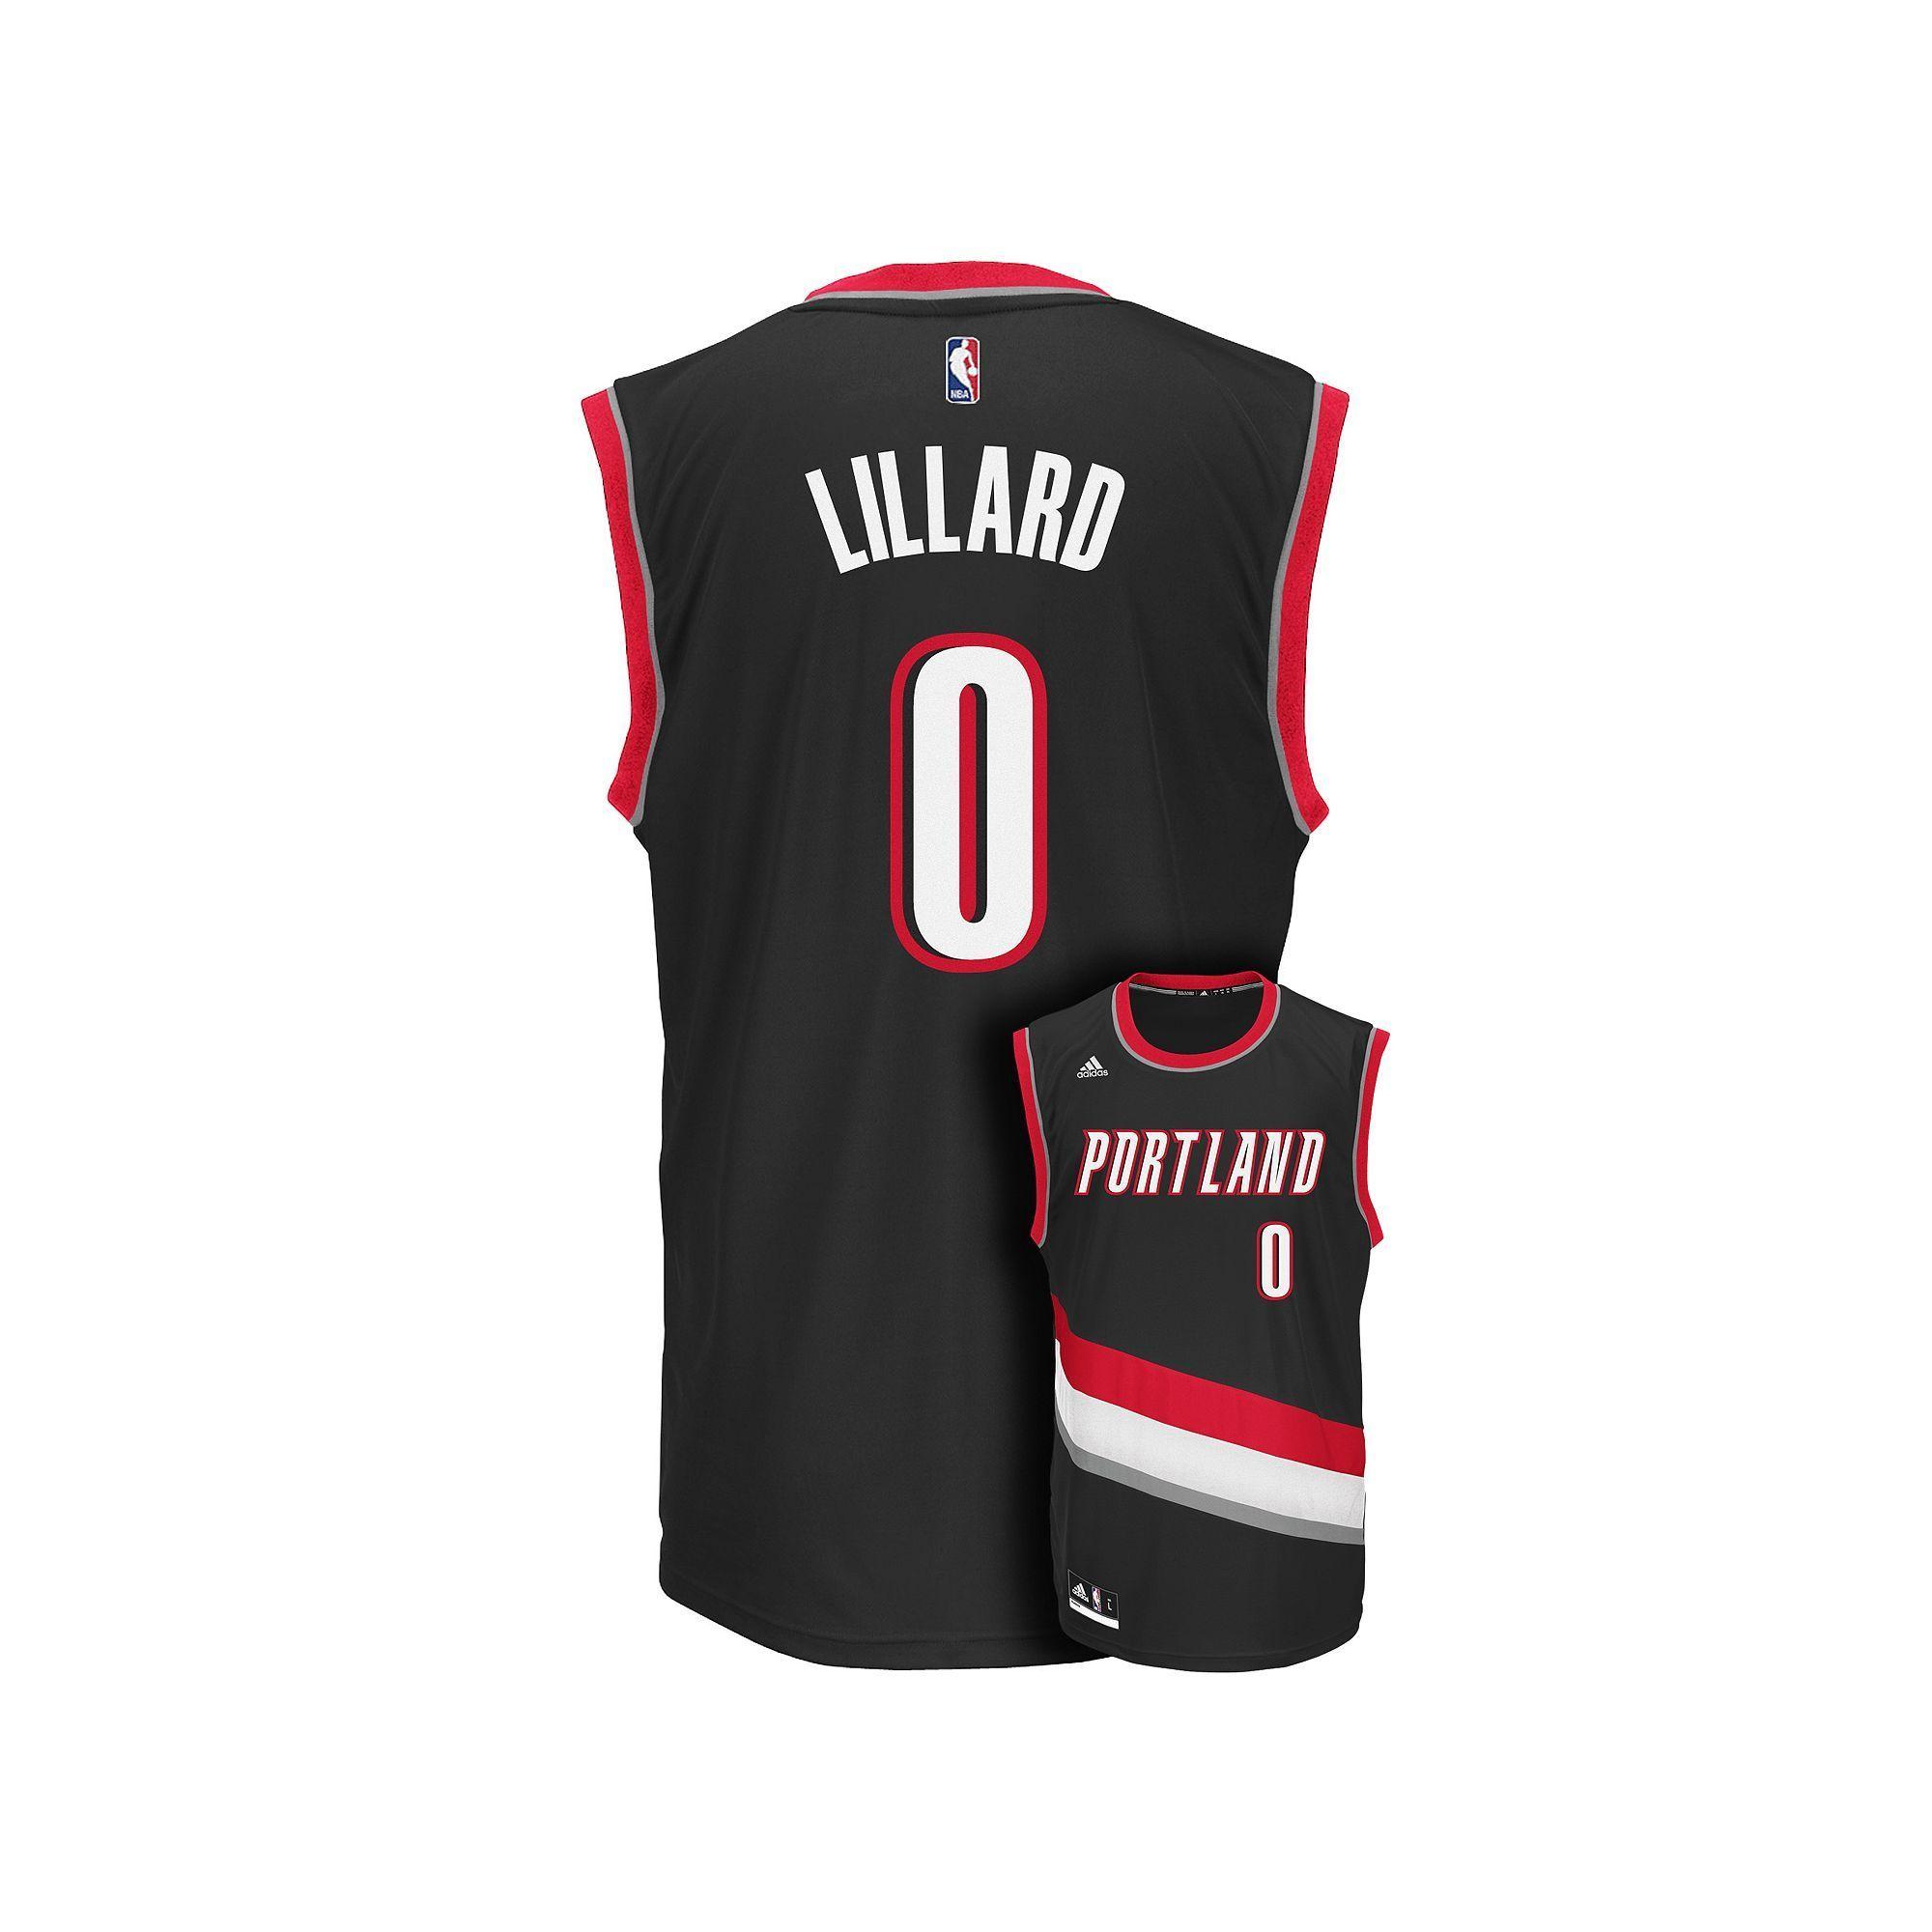 Men's Adidas Portland Trail Blazers Damian Lillard Replica Jersey, Size: Large, Black